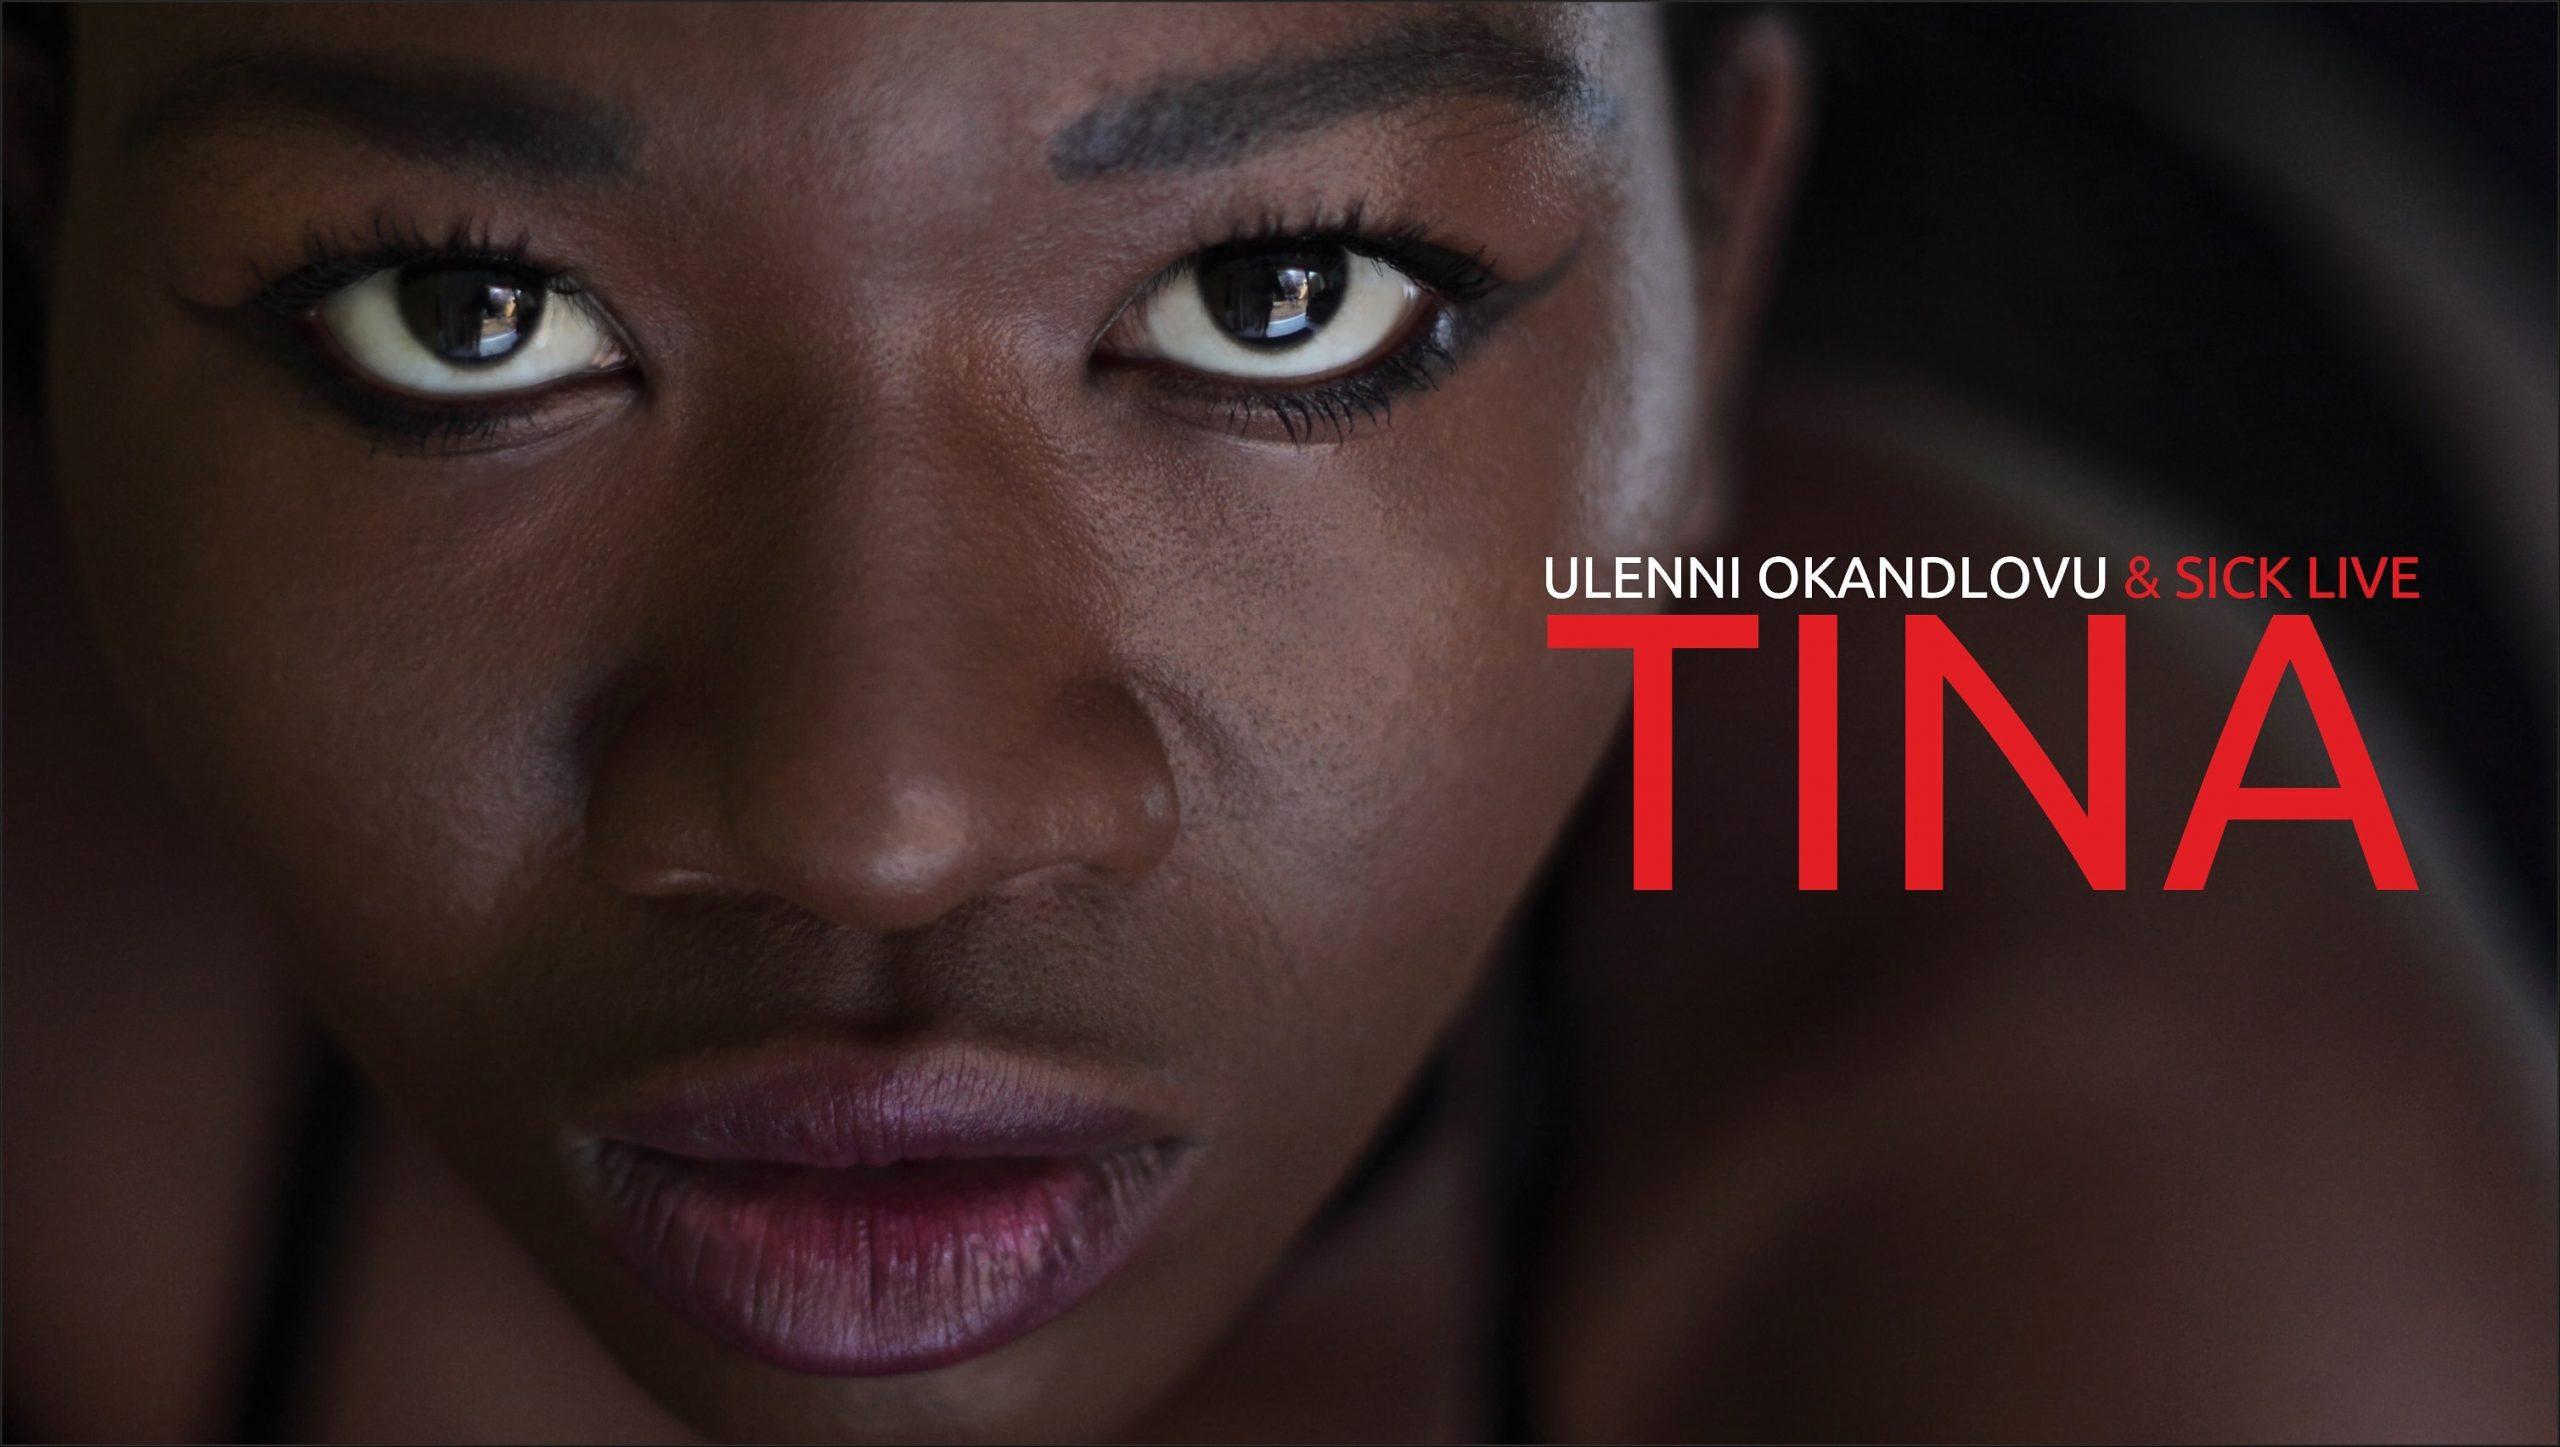 New Music: ULenni OkaNdlovu x Sick Live - Tina